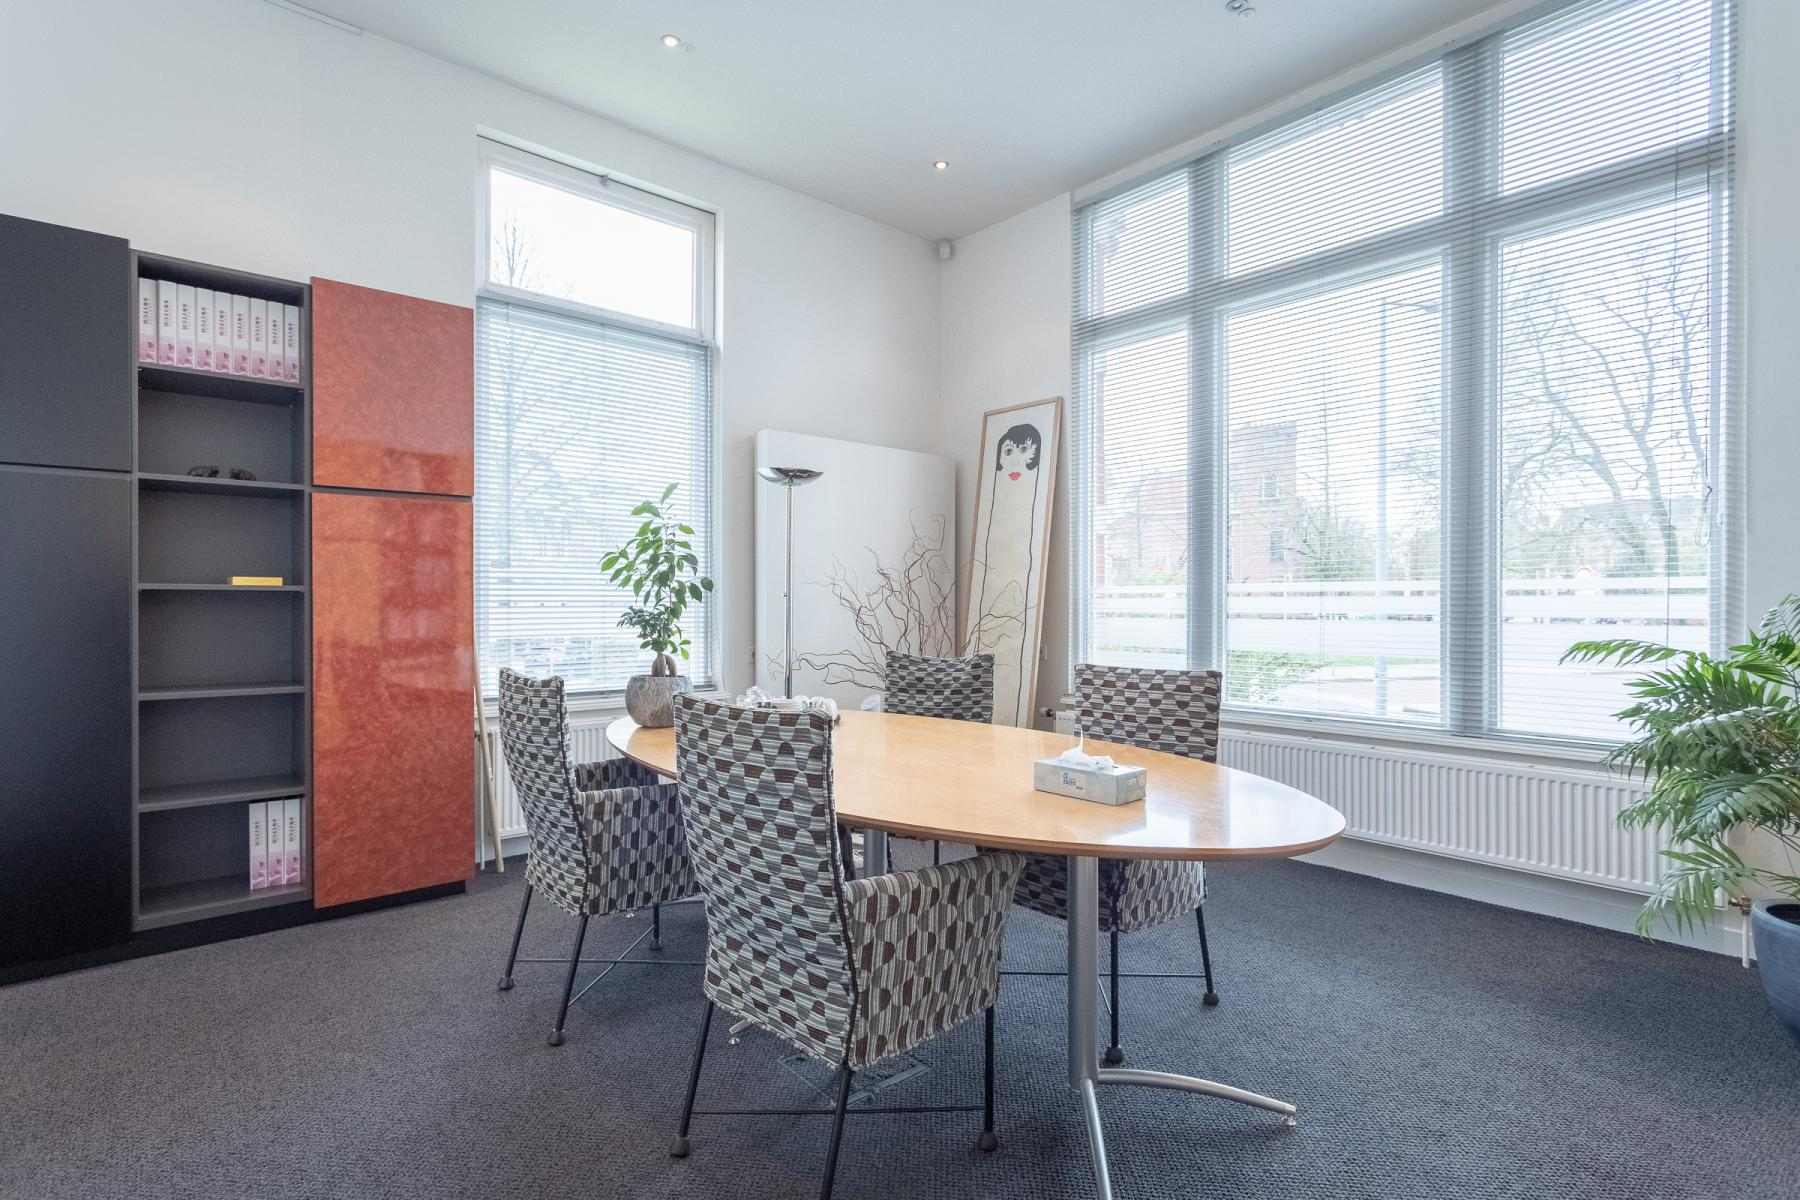 Groningen Centrum kantoorruimte kantoorkamer parkeerplek aanwezig